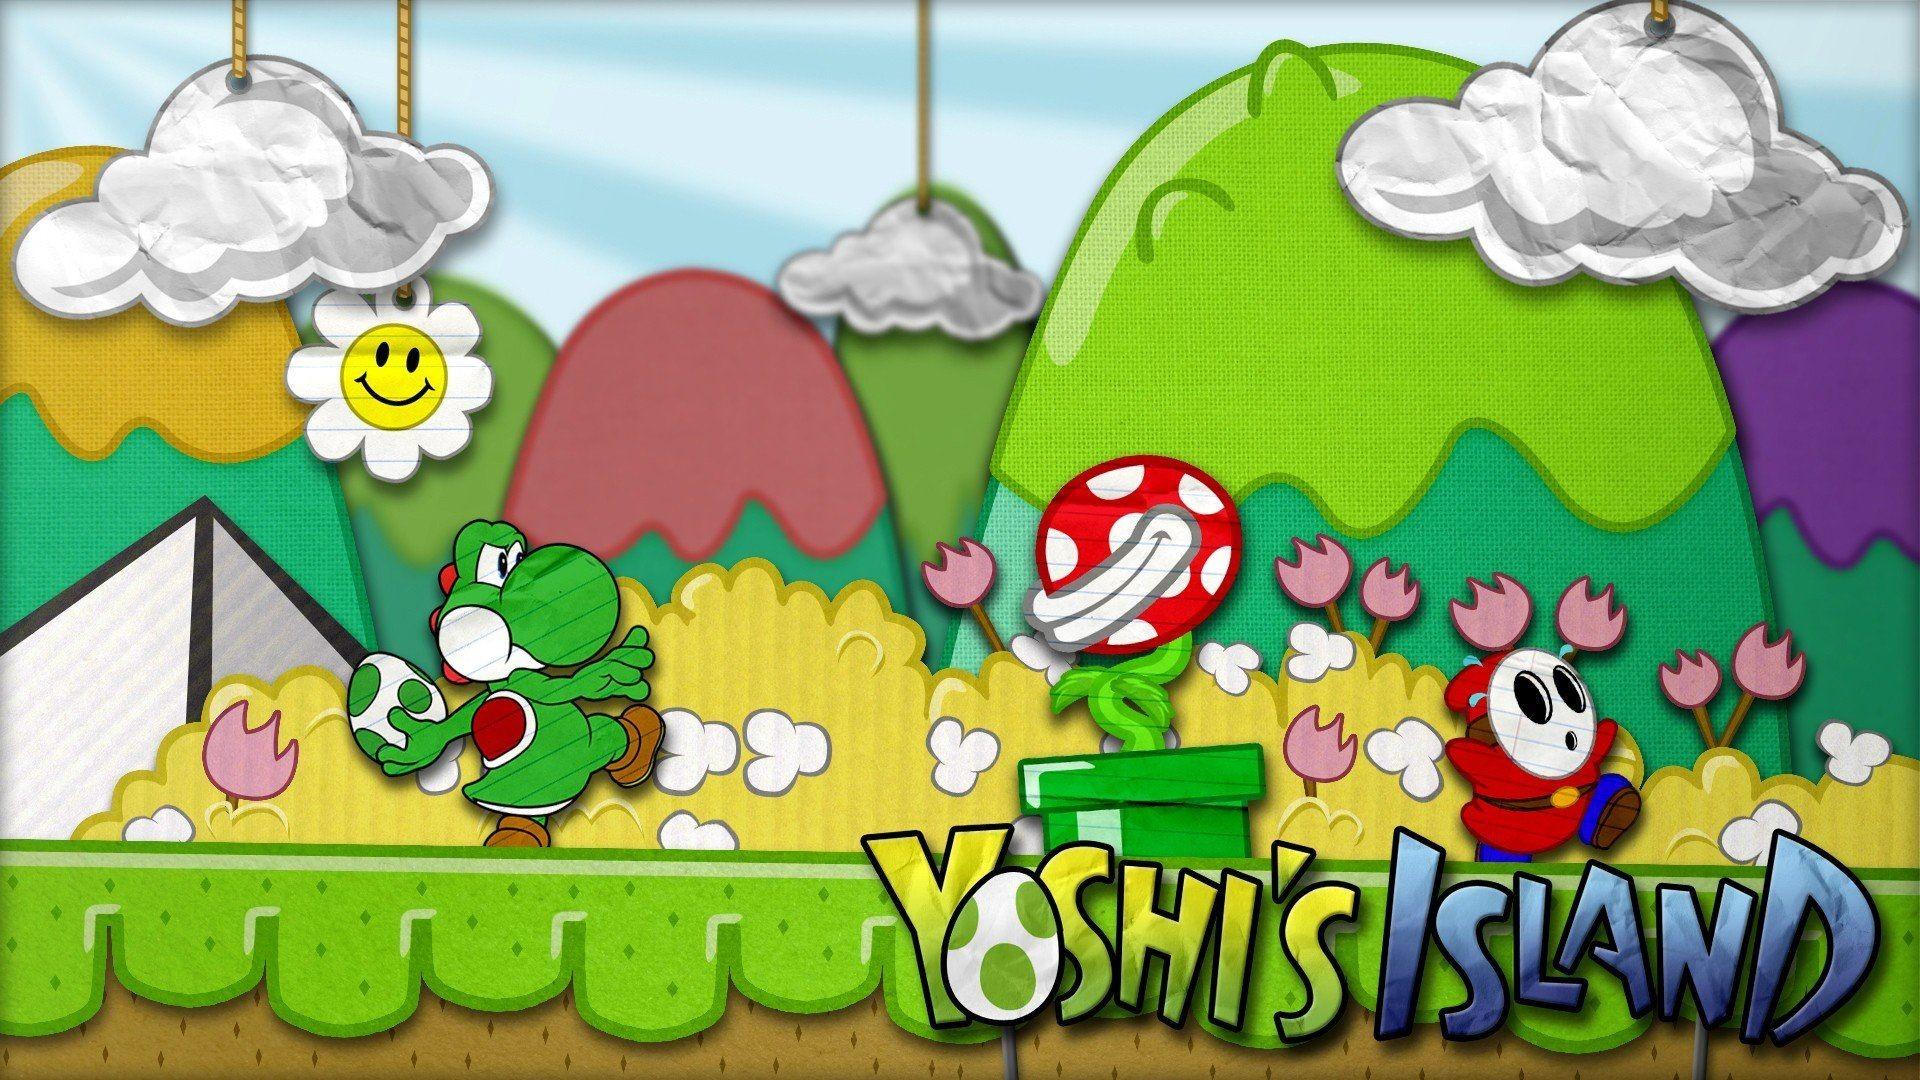 Video games Super Mario Yoshi Shy Guy Piranha Plant wallpaper .